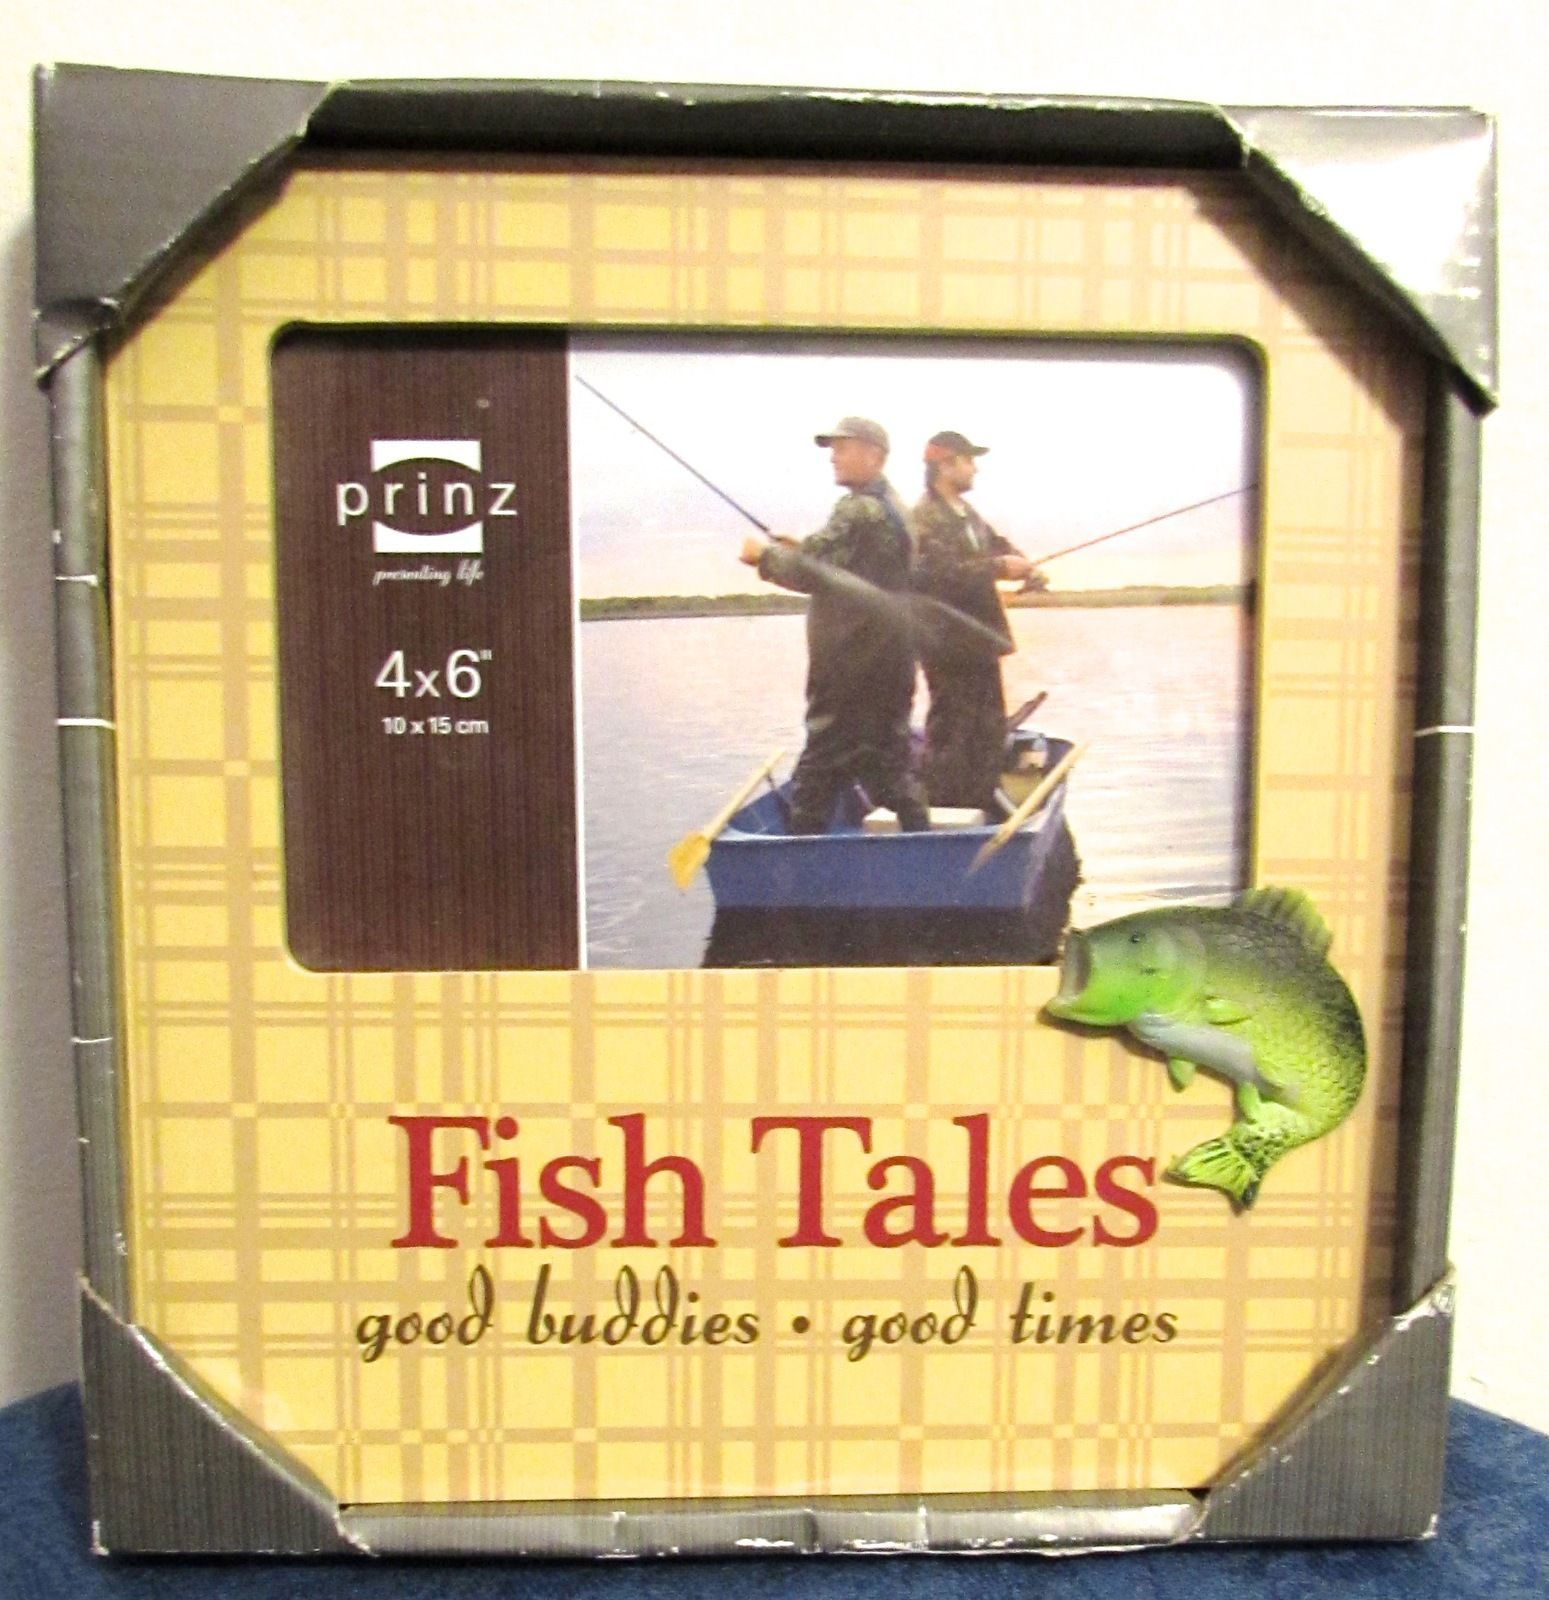 Prinz Fish Tales Resin Wood Frame Beige 4 x 6 Fishing